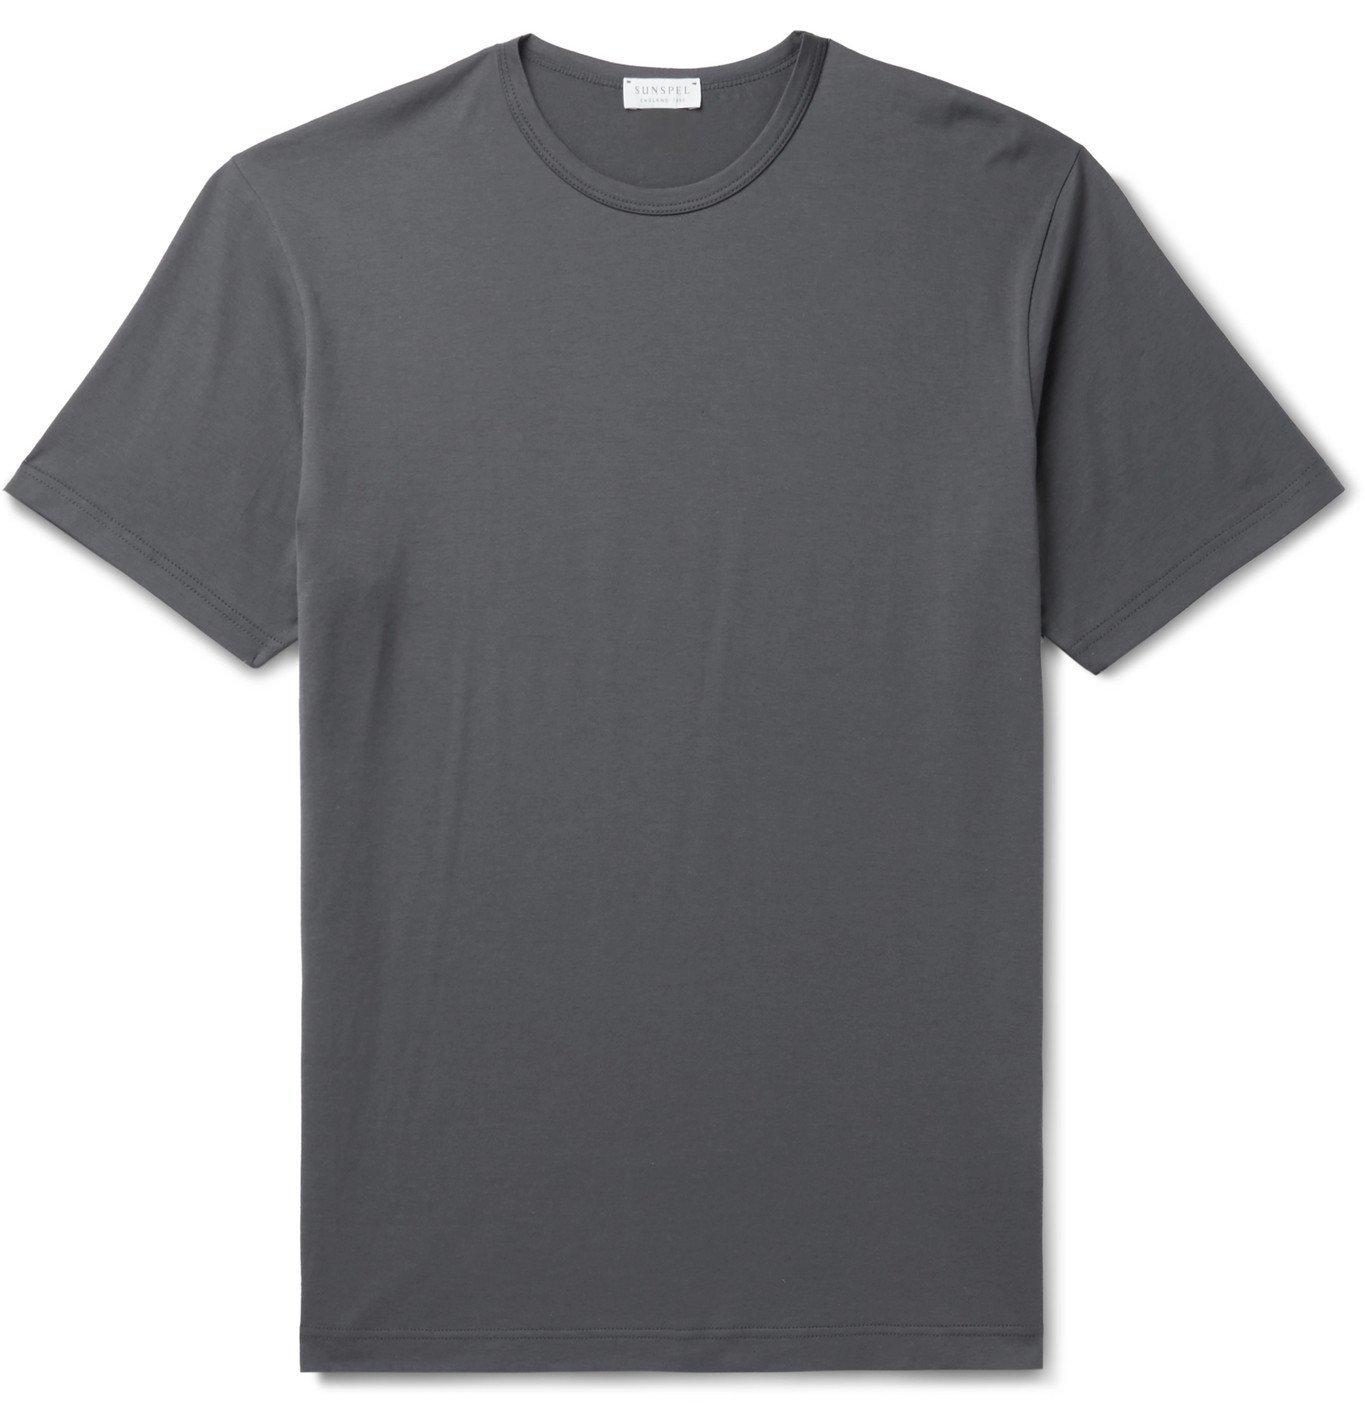 Sunspel - Pima Cotton-Jersey T-Shirt - Gray